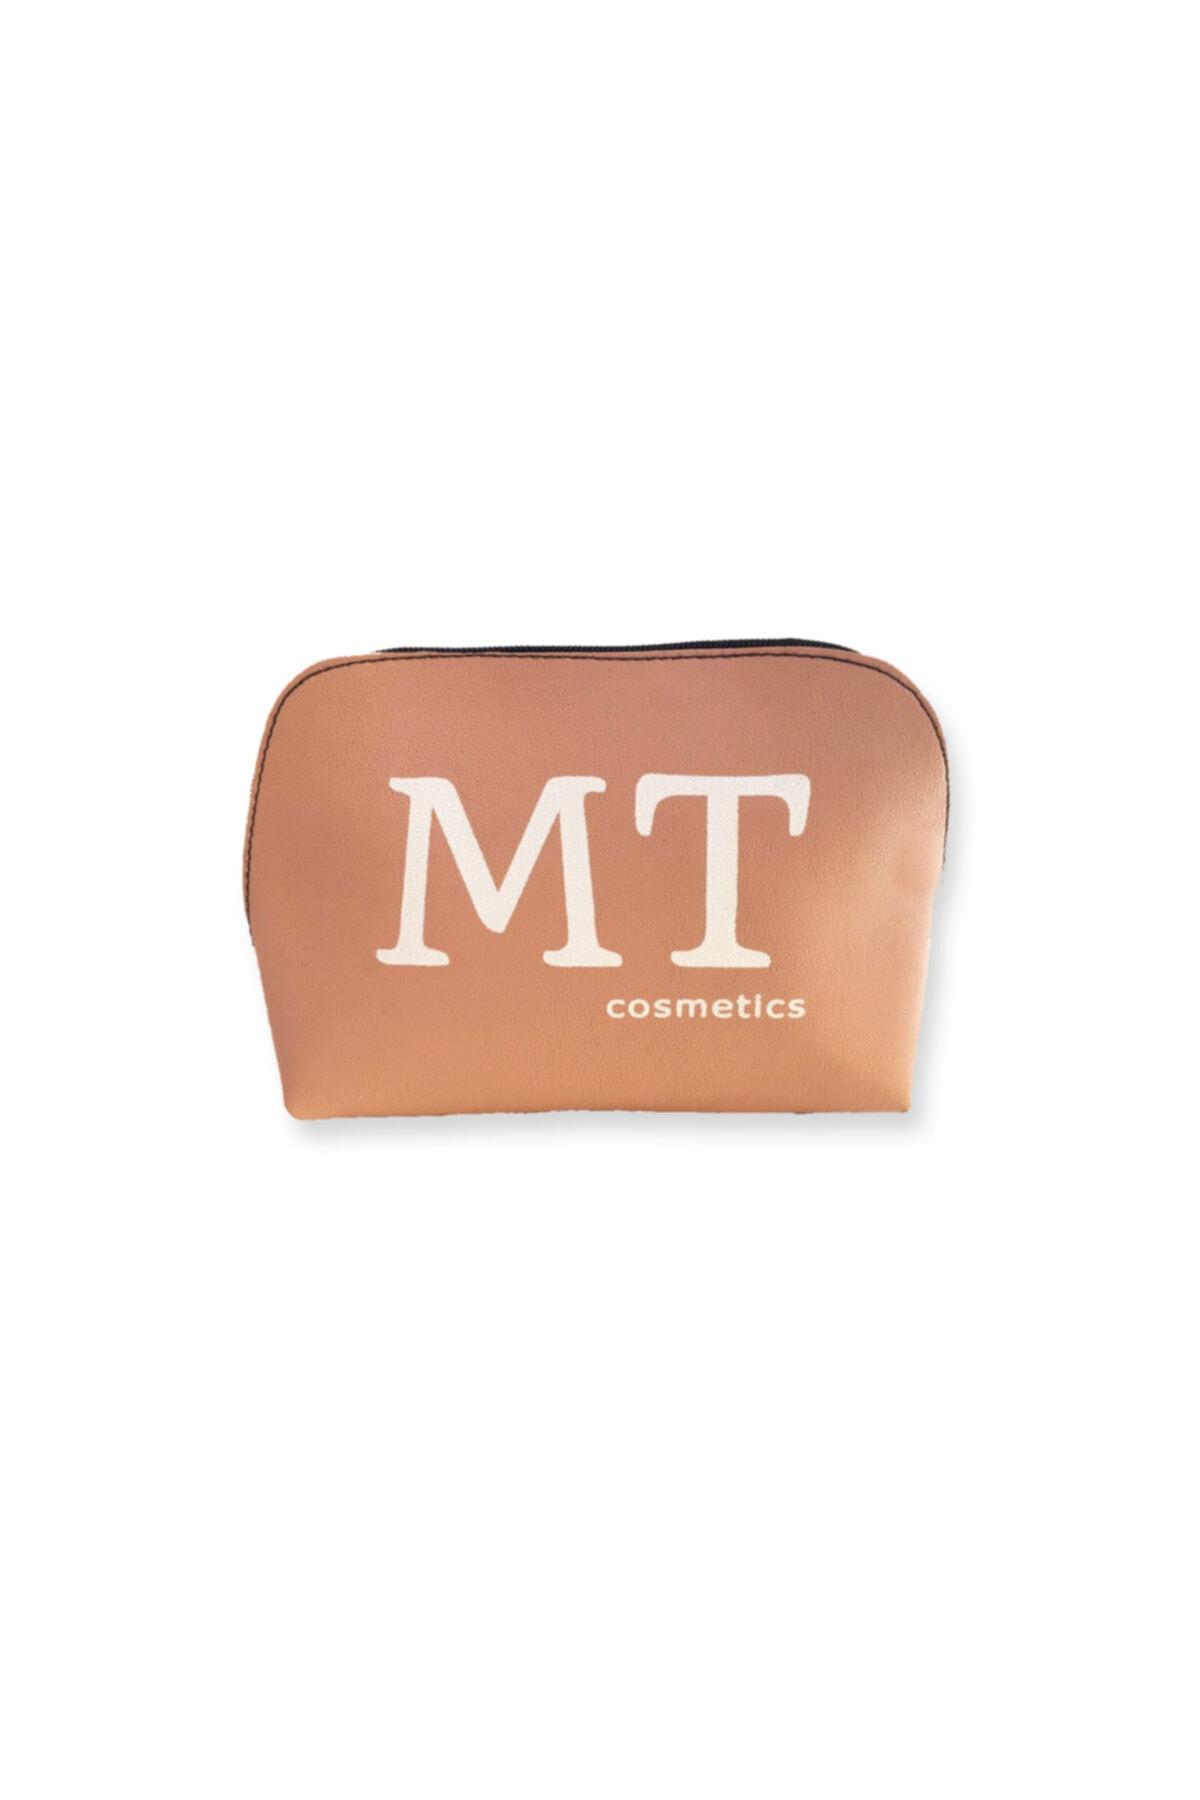 Makeuptime Mt Mat Deri Makyaj Çantası Pudra 1